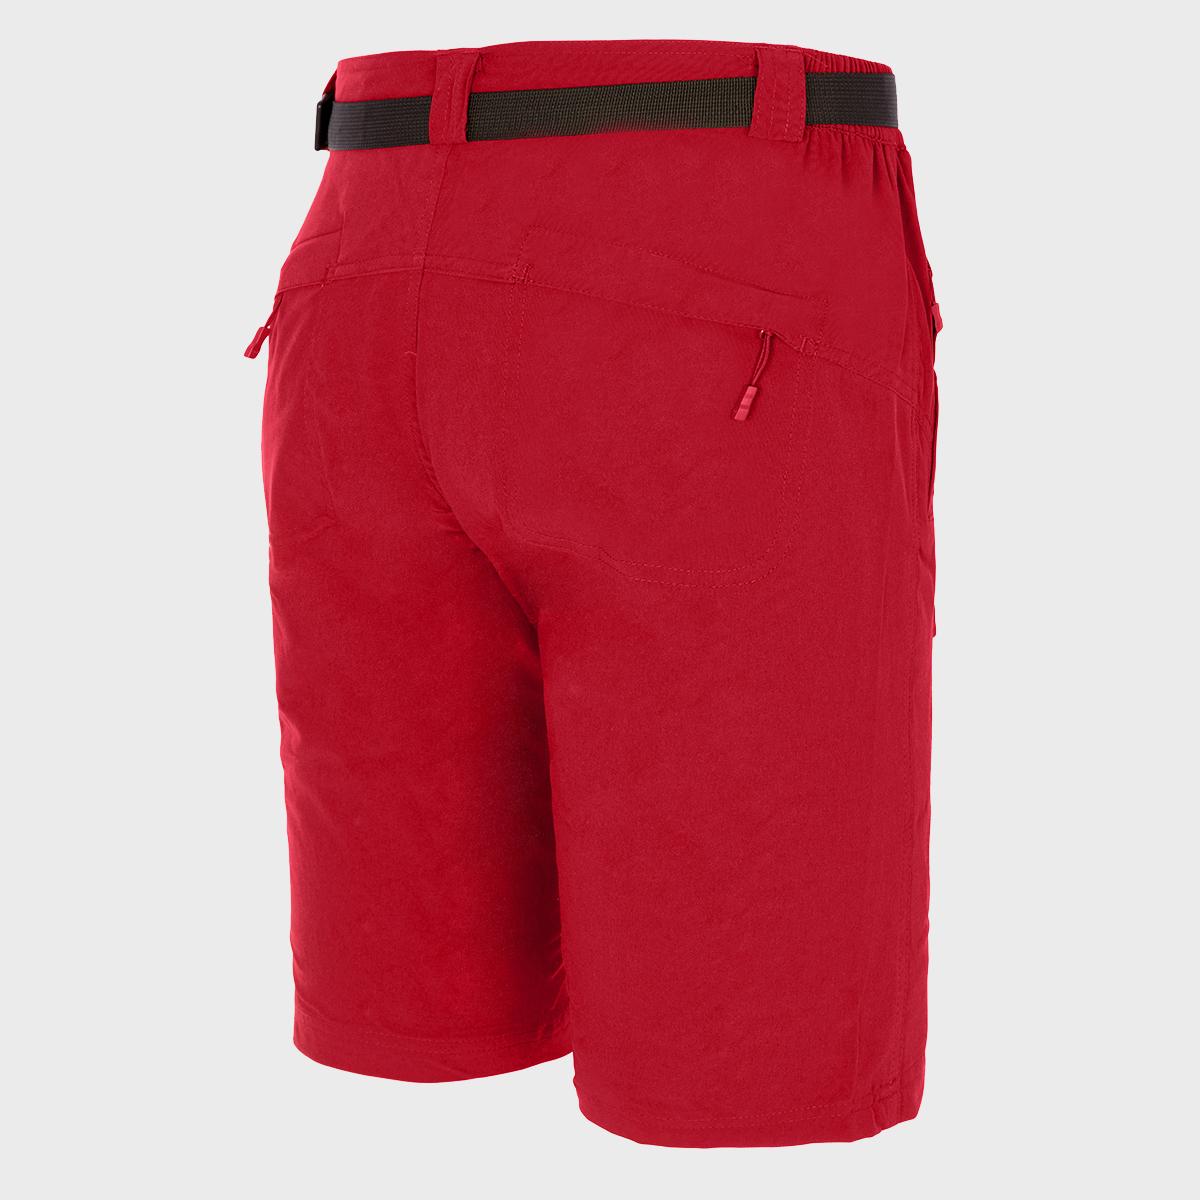 MAN'S BEAR STRETCH SHORT PANT RED